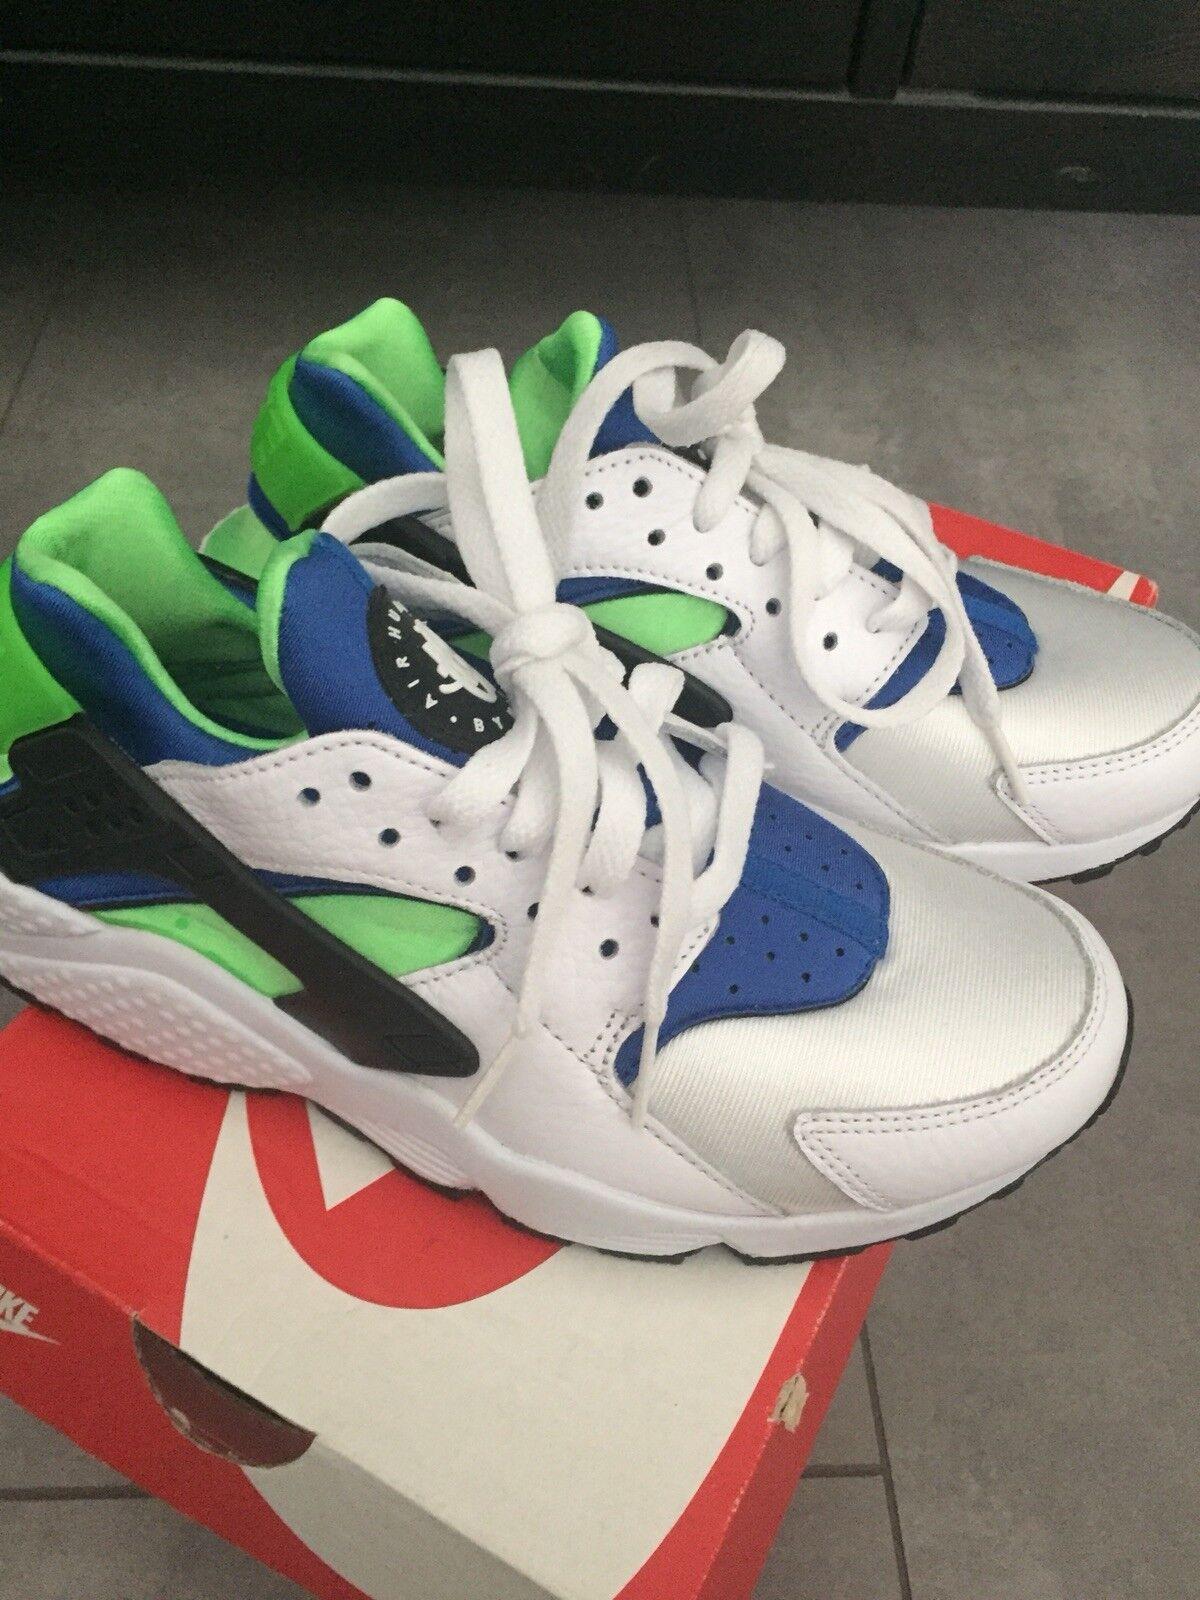 innovative design 1bfef 126fc Nike Air Huarache Originale US Farbkombo Neu 318429 100 US Originale 6 Eur  38,5 Jordan Yeezy 623fdf